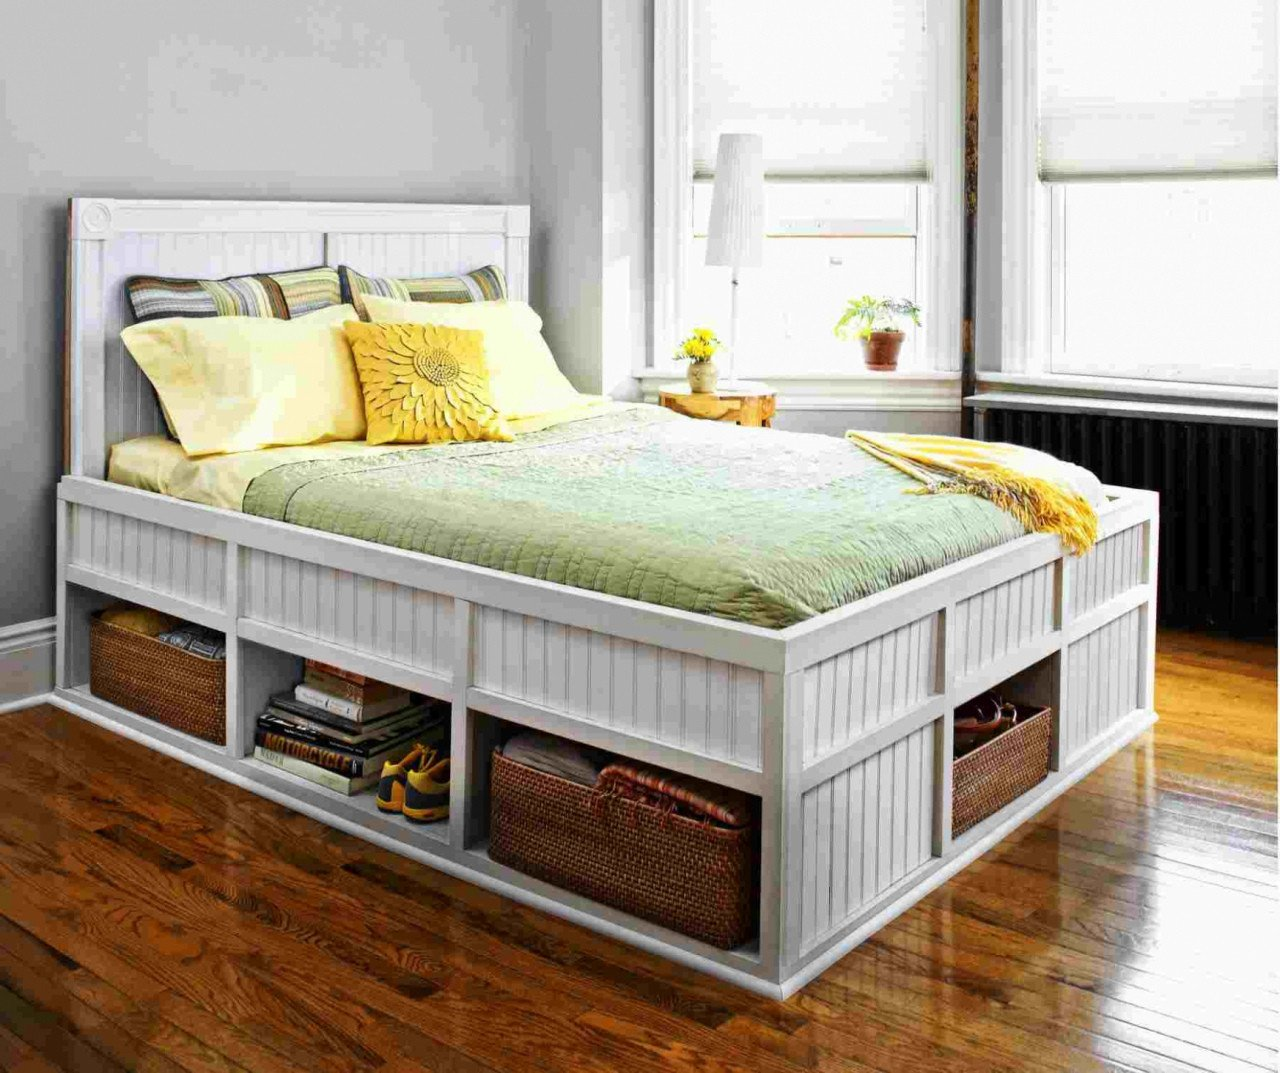 Bedroom Set with Storage Inspirational Diy Platform Bed with Drawers — Procura Home Blog